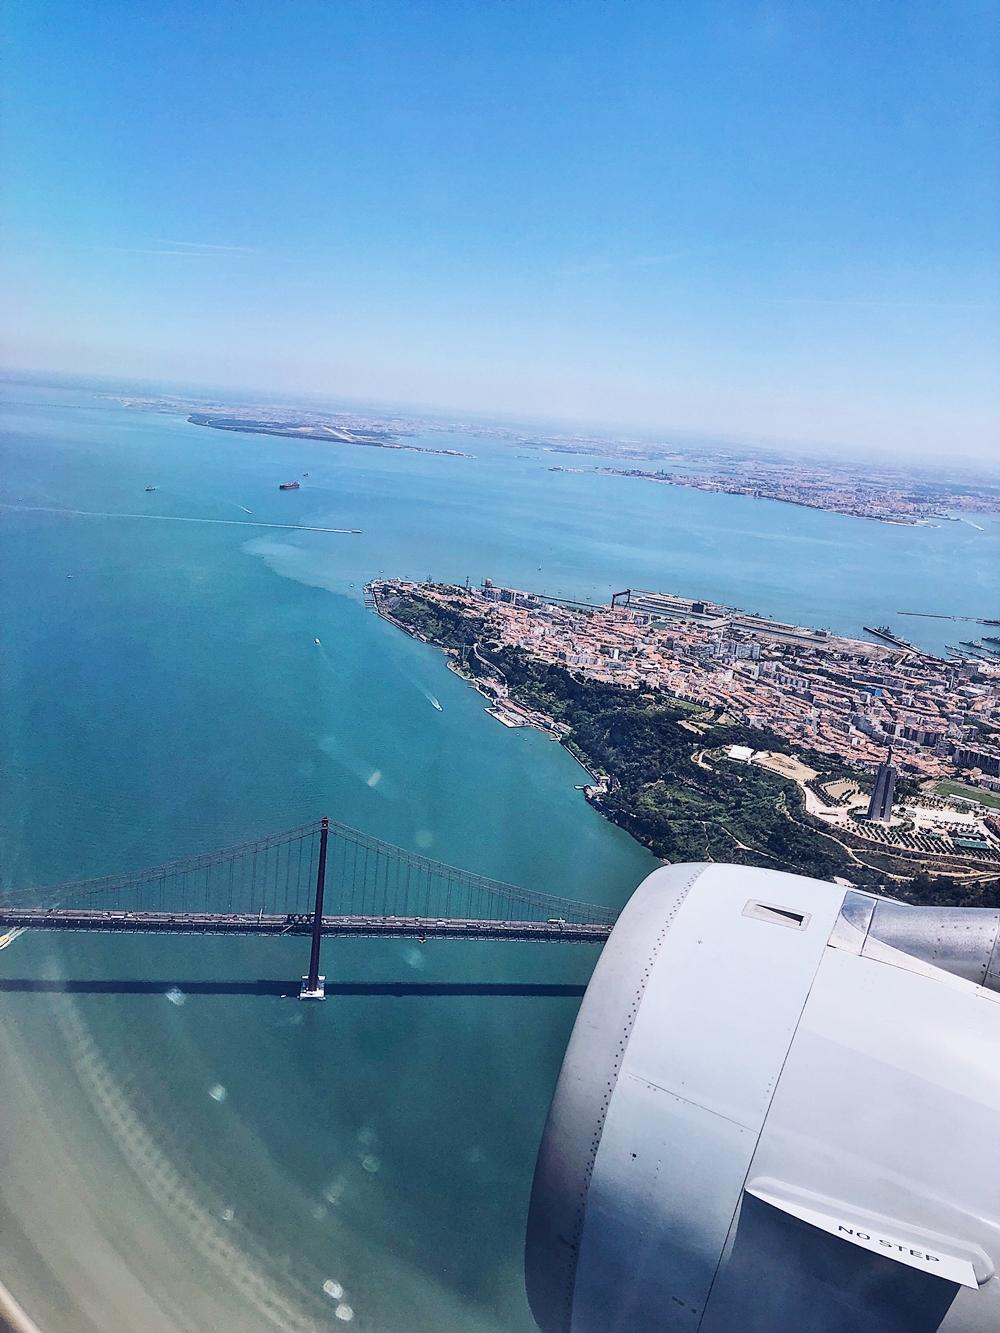 Roadtrip durch Portugal-Portugal-Brücke-Lissabon-Flugzeug,tejo